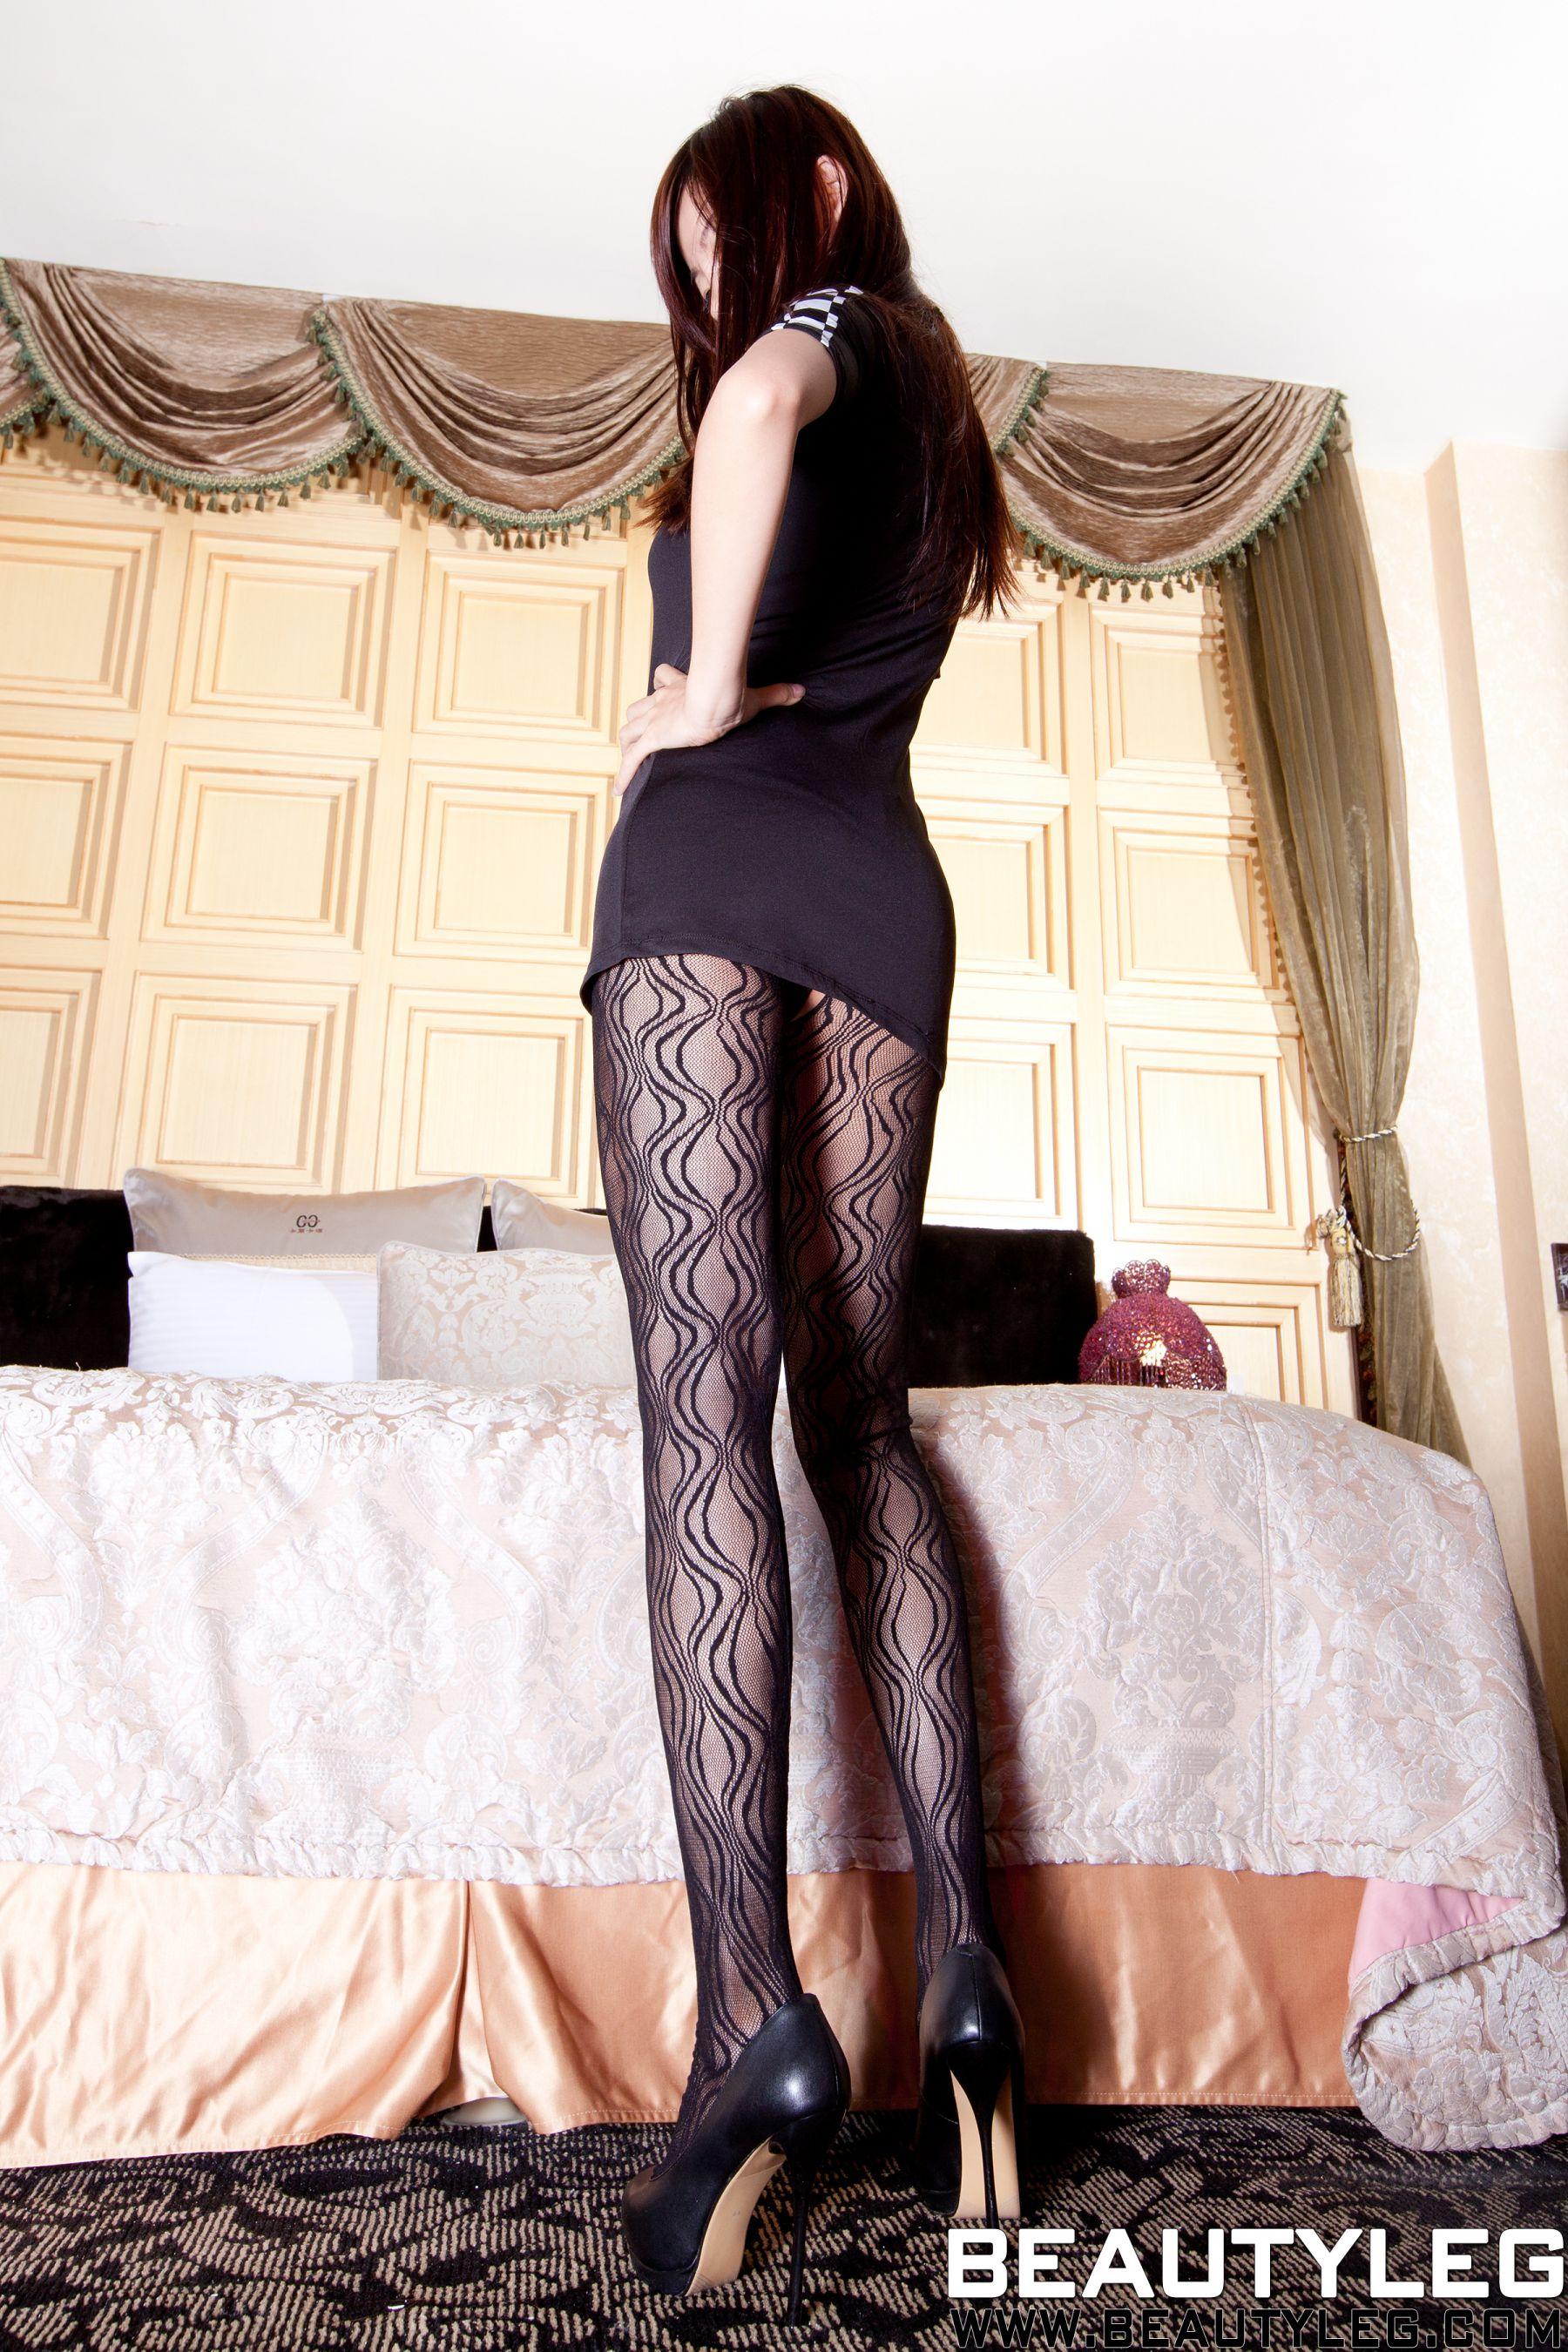 VOL.1041 [Beautyleg]丝袜美腿情趣丝袜:腿模Sabrina高品质写真套图(63P)